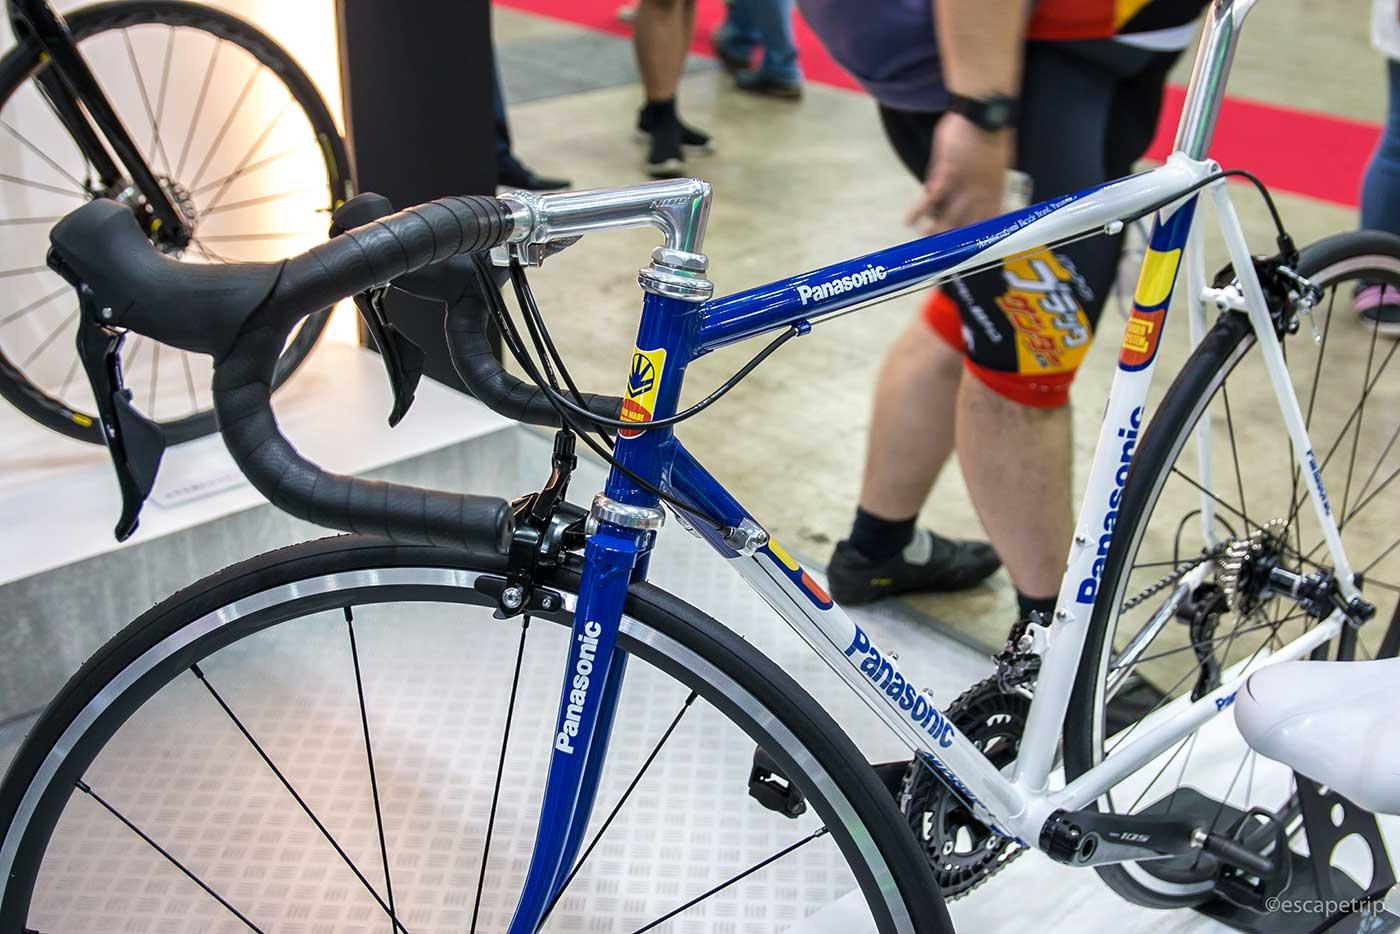 Panasonicのクロモリ自転車